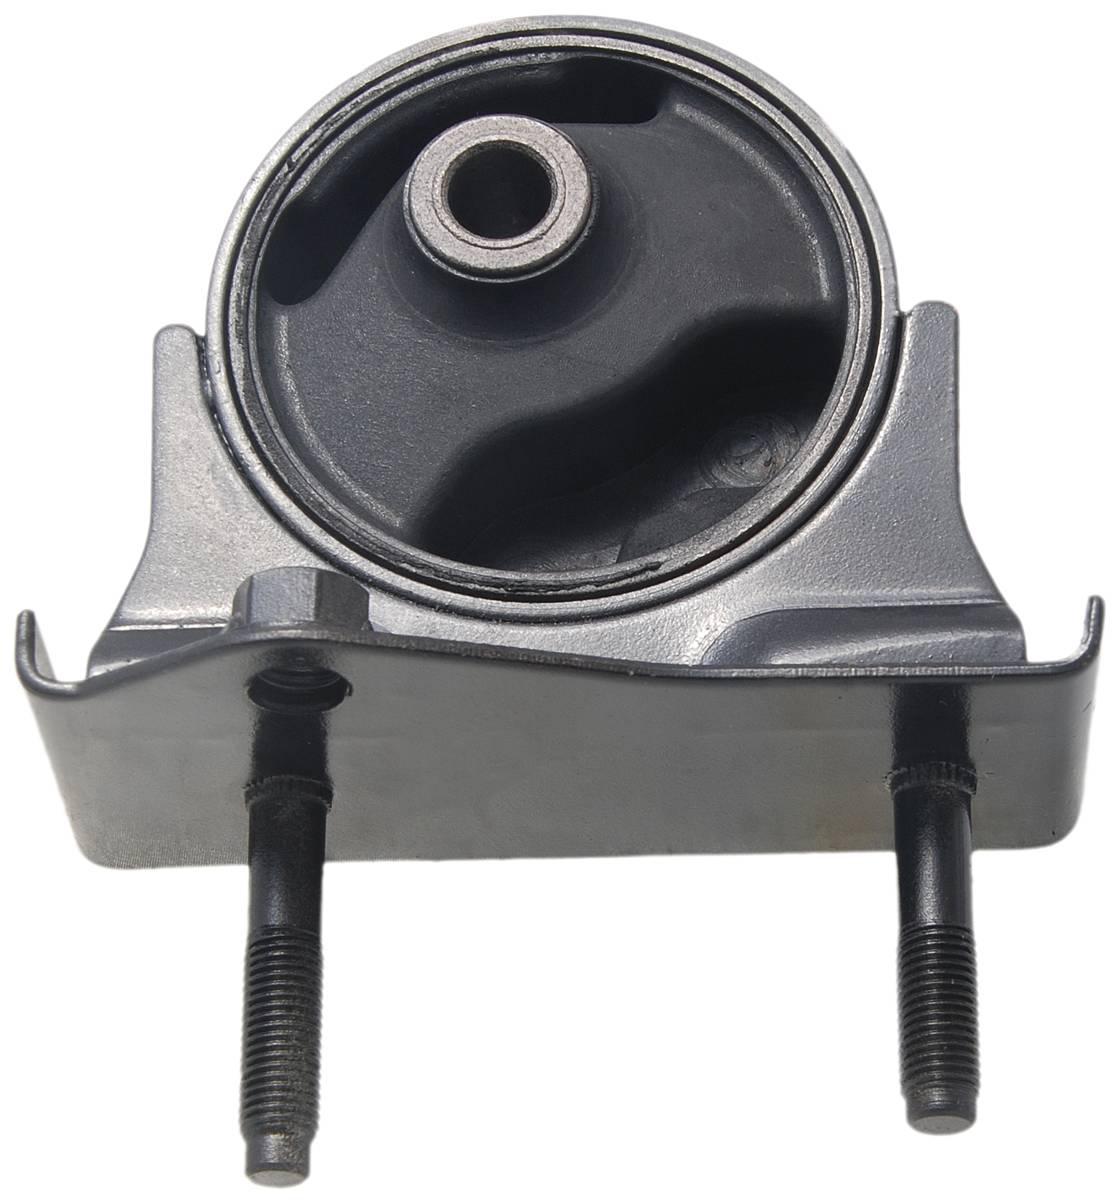 rear engine motor mount toyota rav4 aca2 2000 2005. Black Bedroom Furniture Sets. Home Design Ideas